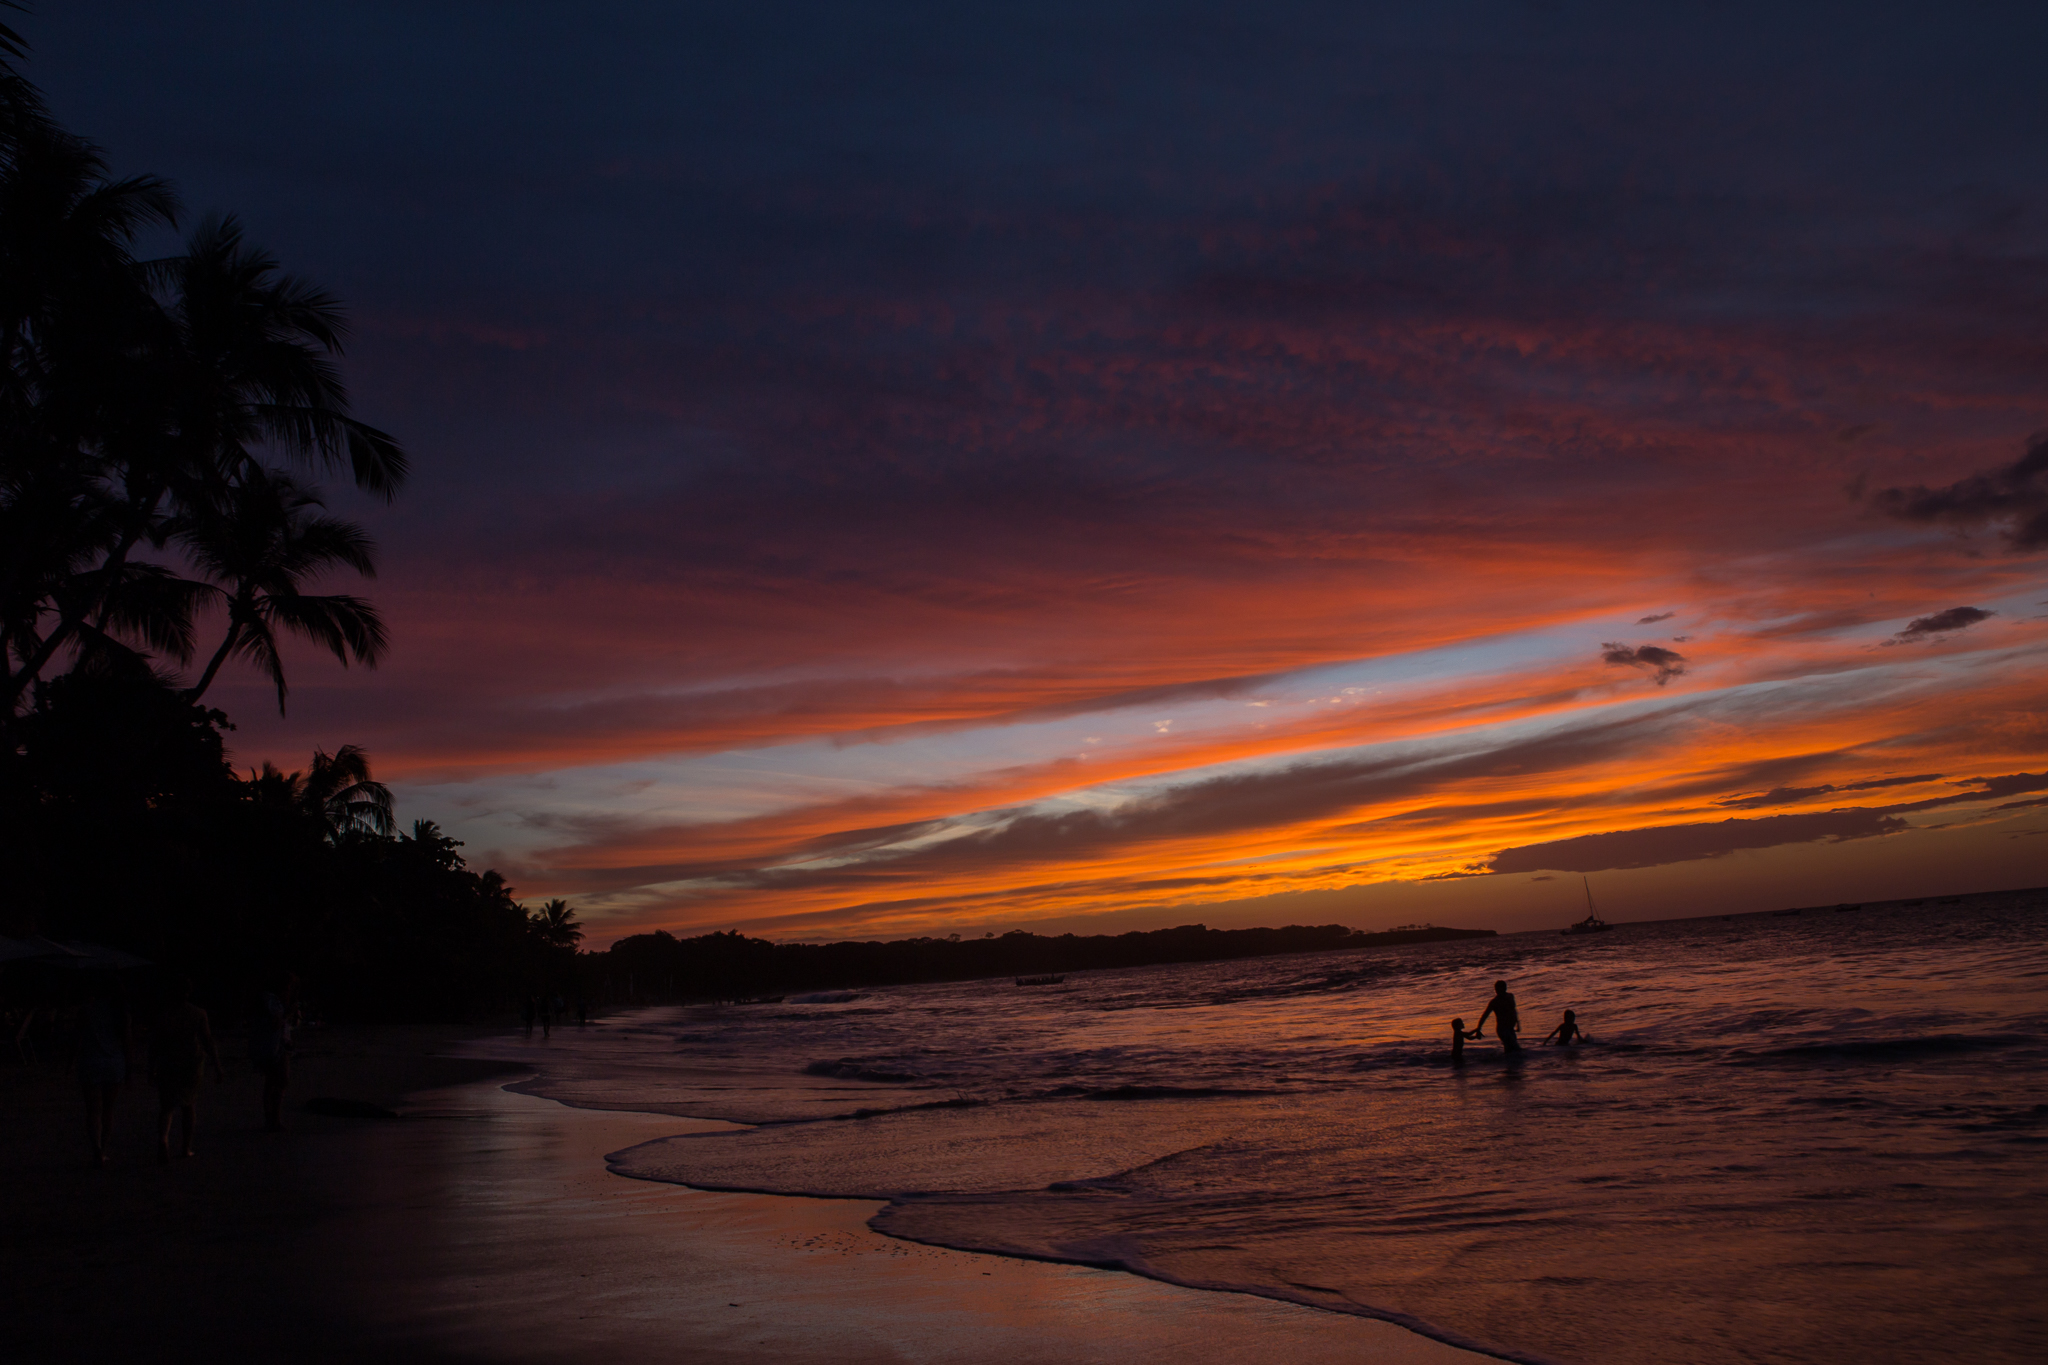 costarica-221-2.jpg